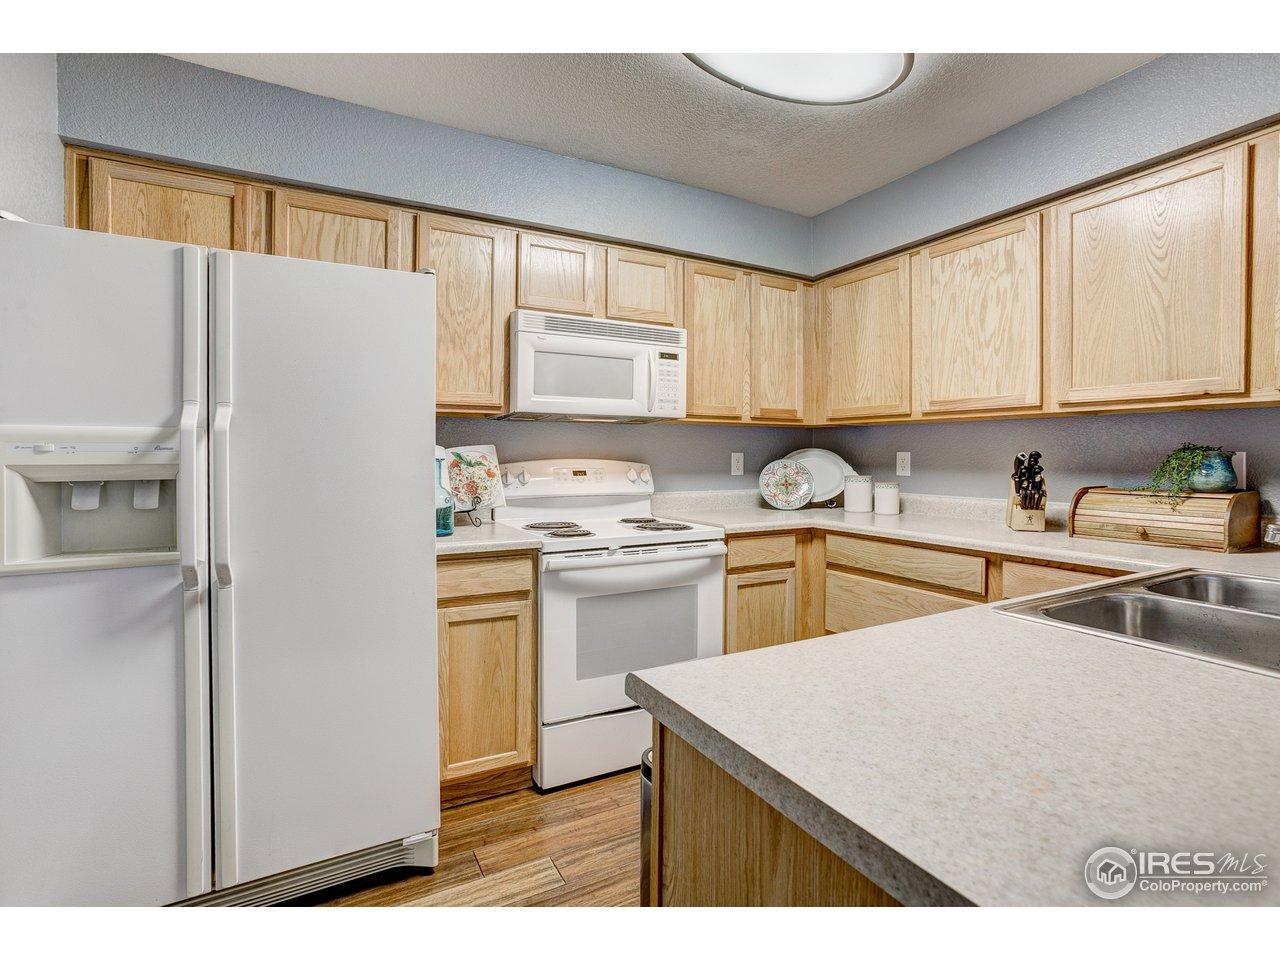 Sunny Kitchen w/Abundant Counter Space